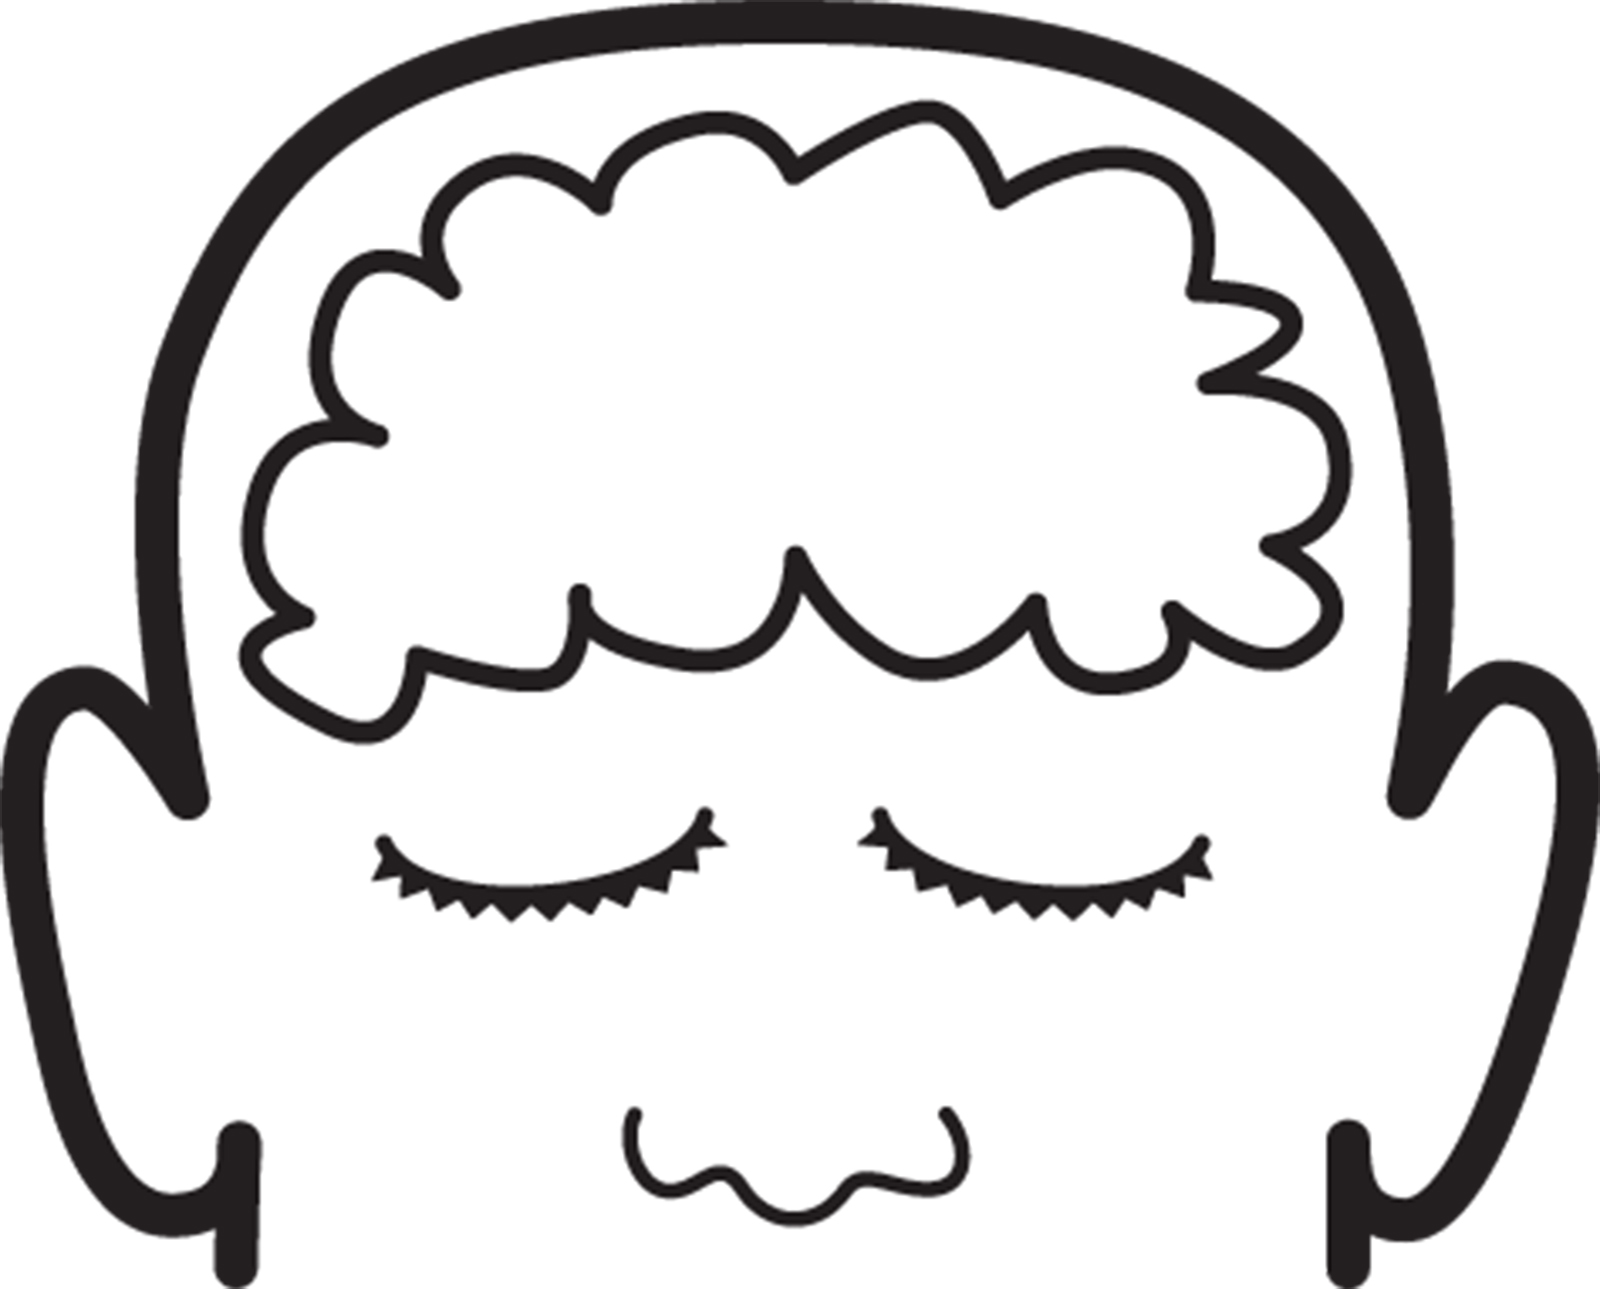 Drawn brains blank Brain Download